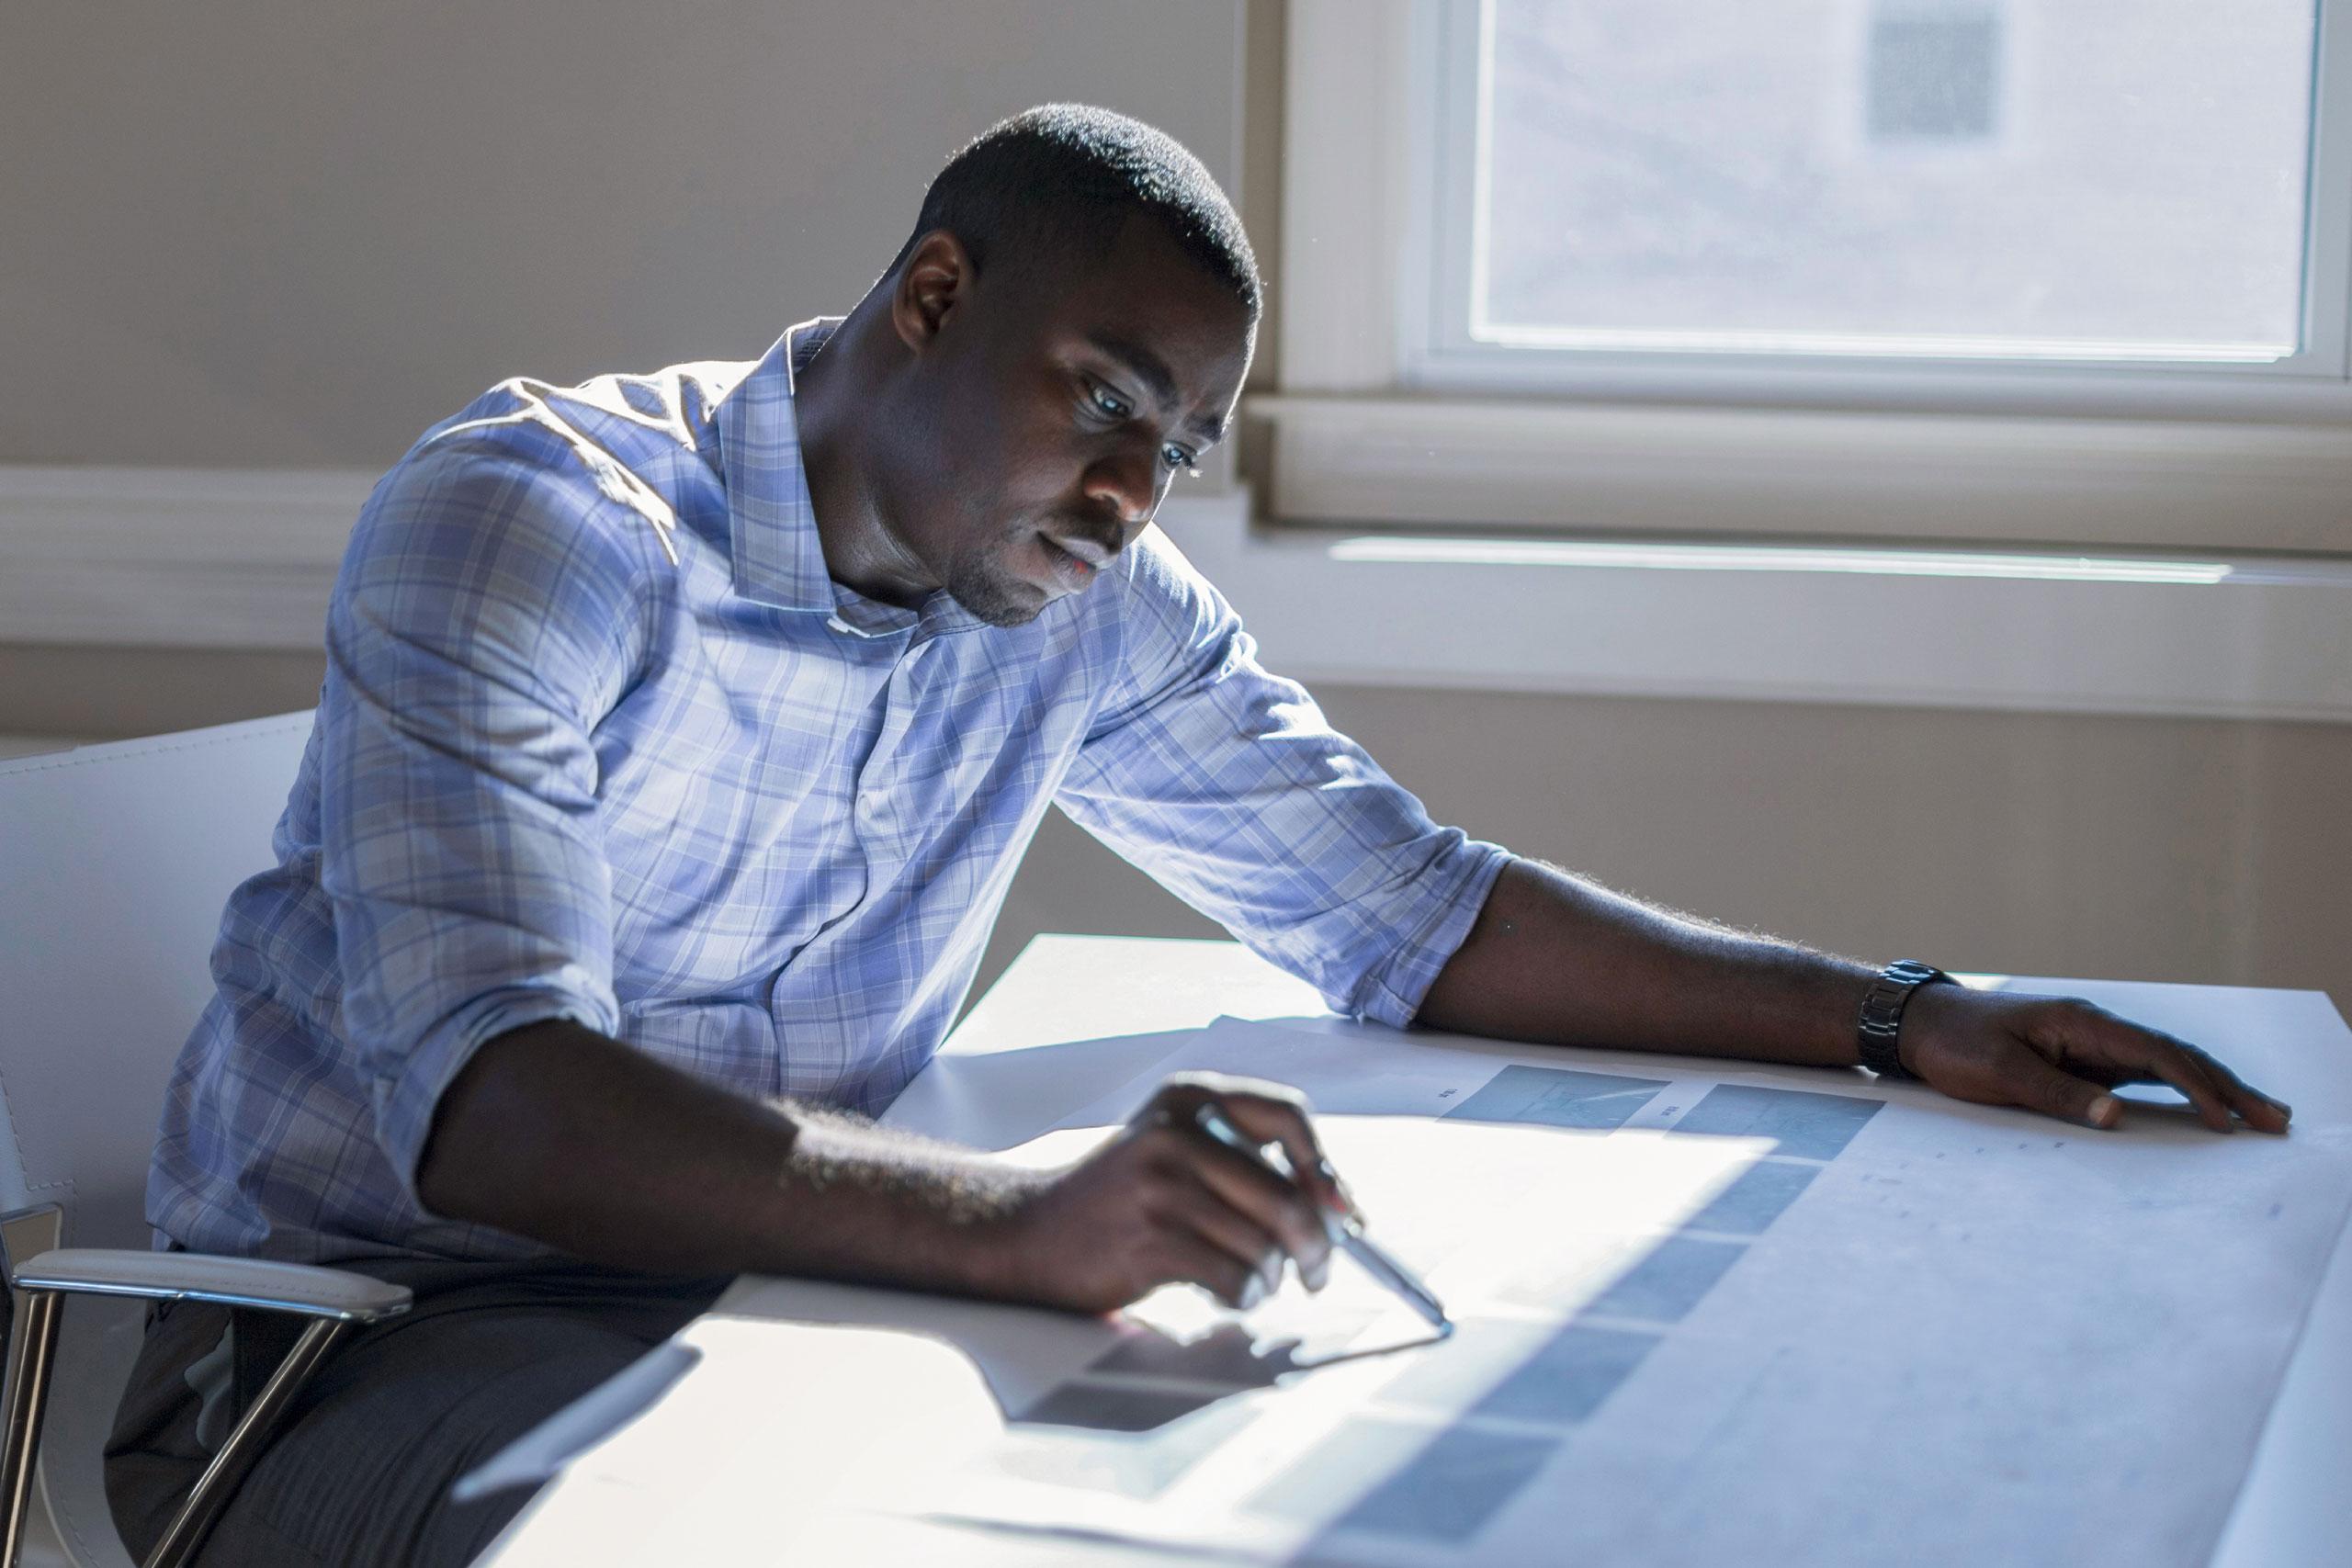 Leroy Ali-Osman Named Associate Principal of Andre Johnson Architects